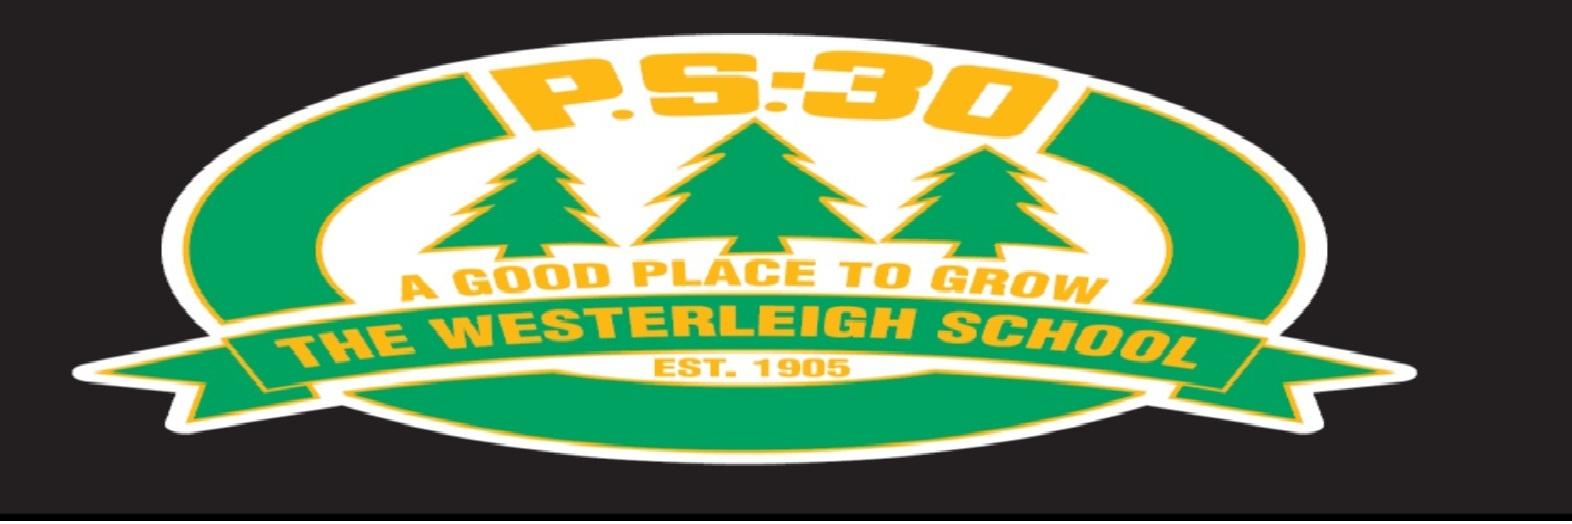 Fifth Grade Math - PS30 (31R030) Westerleigh